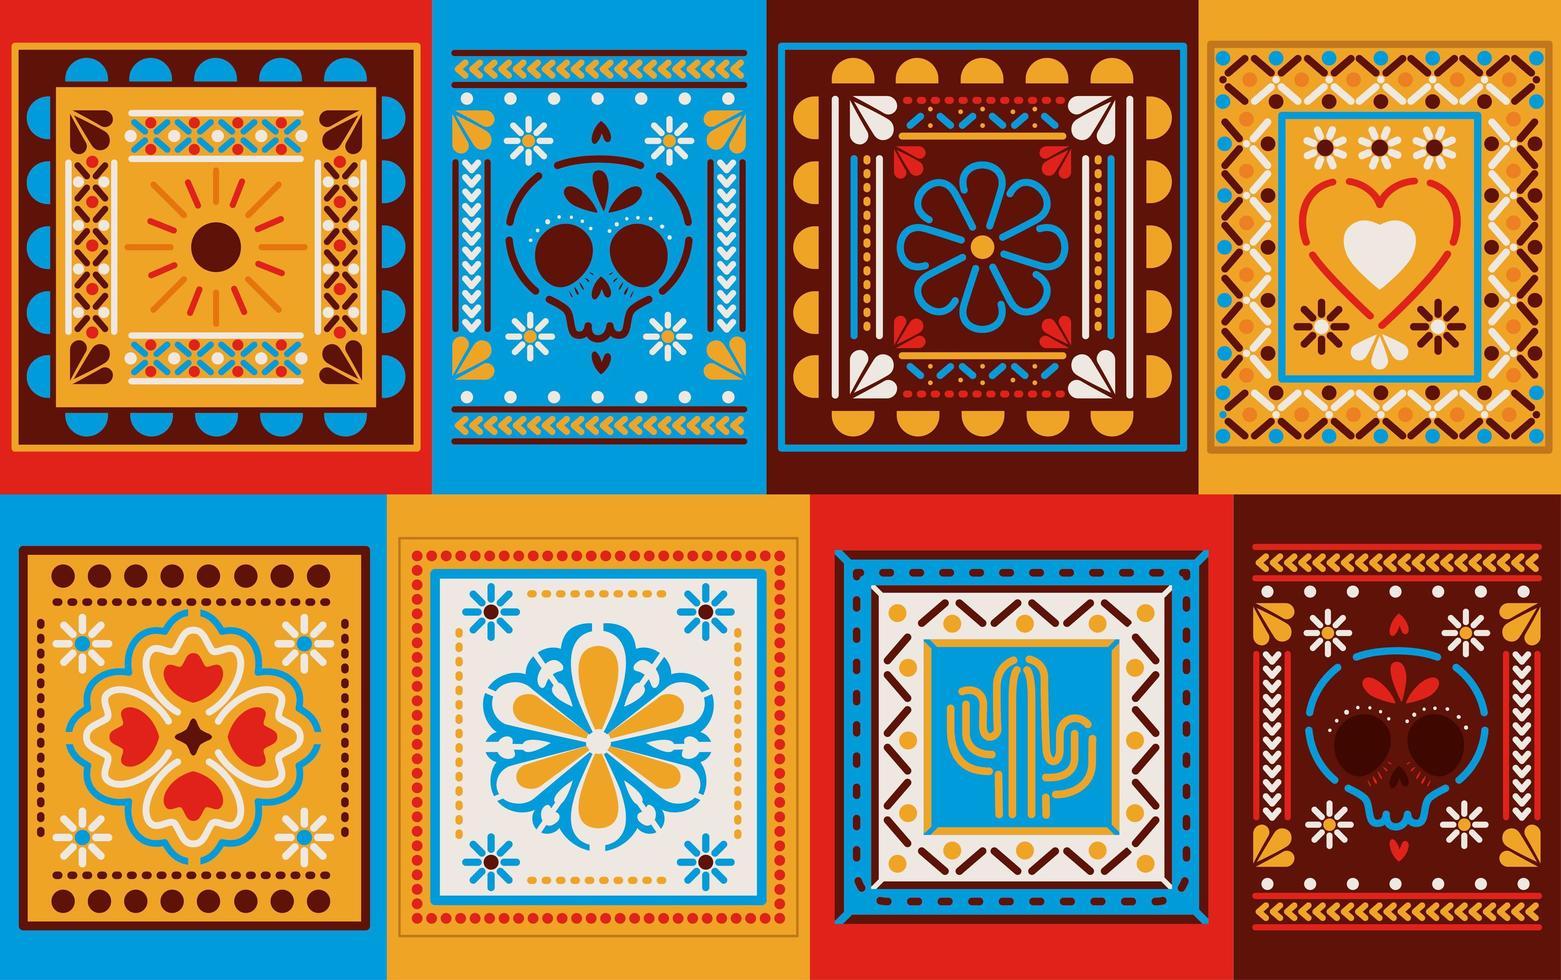 piastrelle colorate messicane vettore